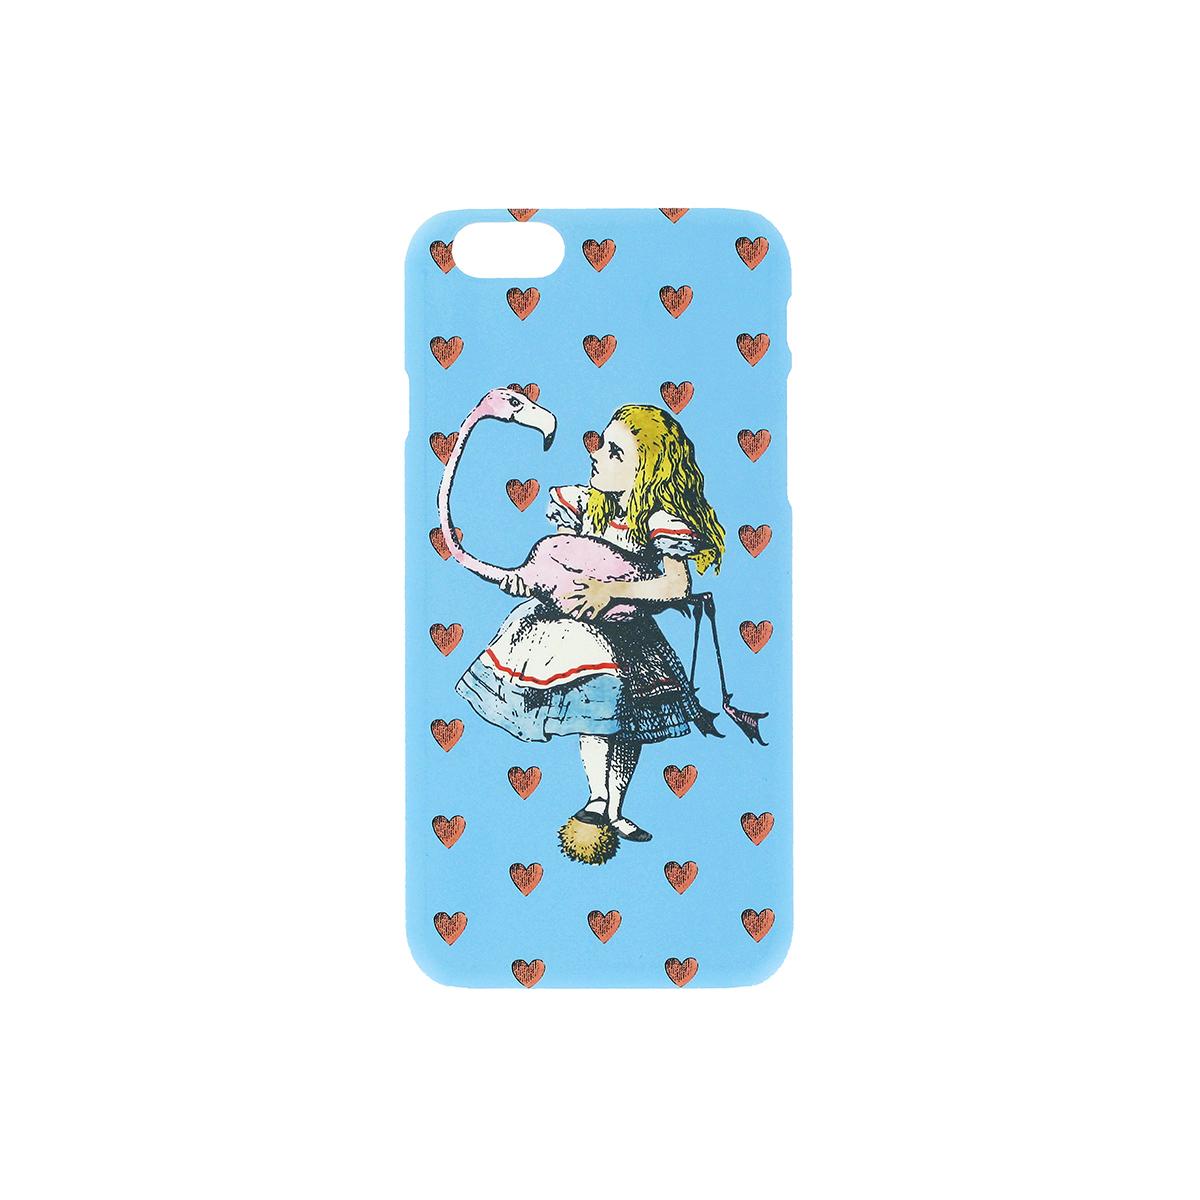 Alice in Wonderland iPhone 7/8 cover